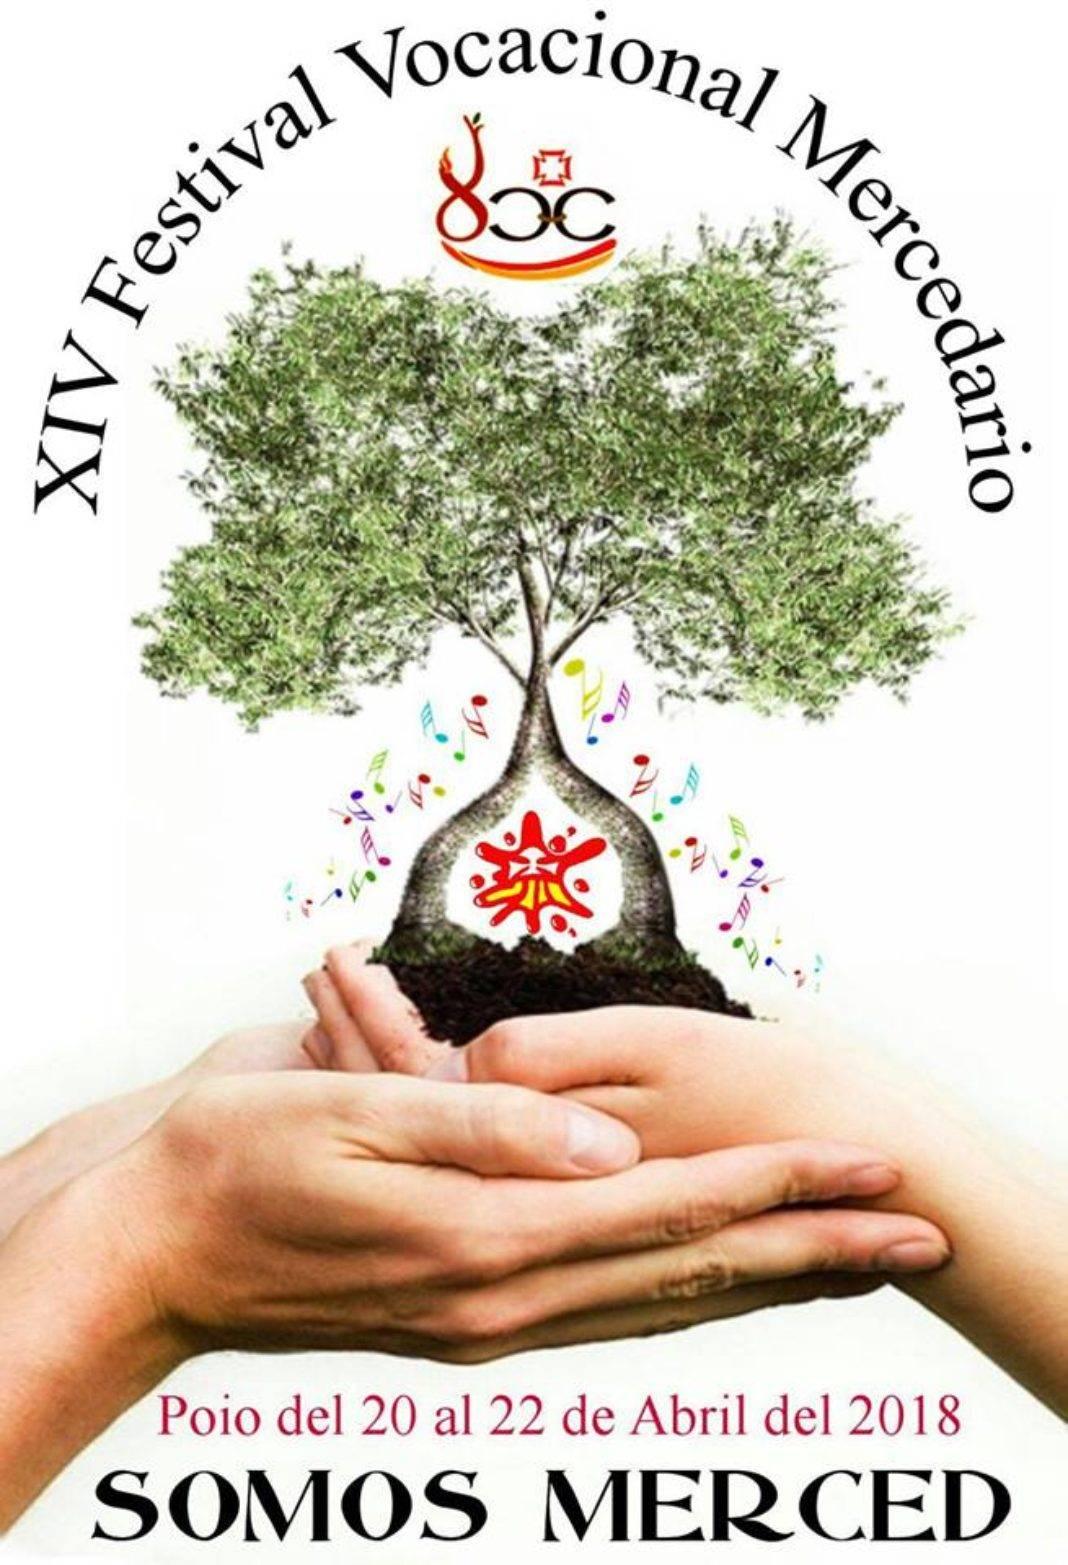 XIV Festival vocacional mercedario 1 1068x1565 - Herencia estará el el XIV Festival Vocacional Mercedario de Poio